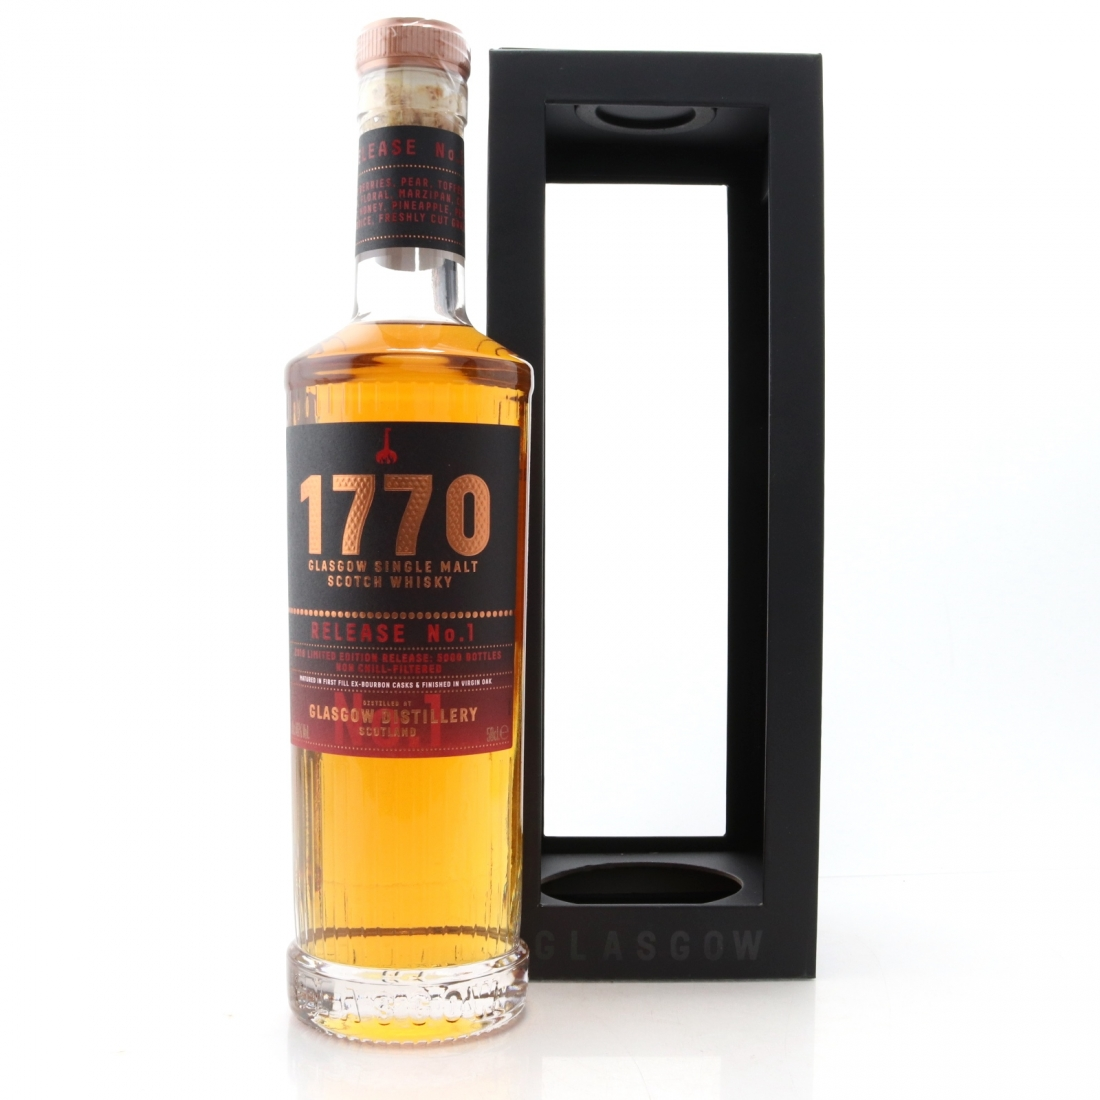 Glasgow '1770' Release No.1